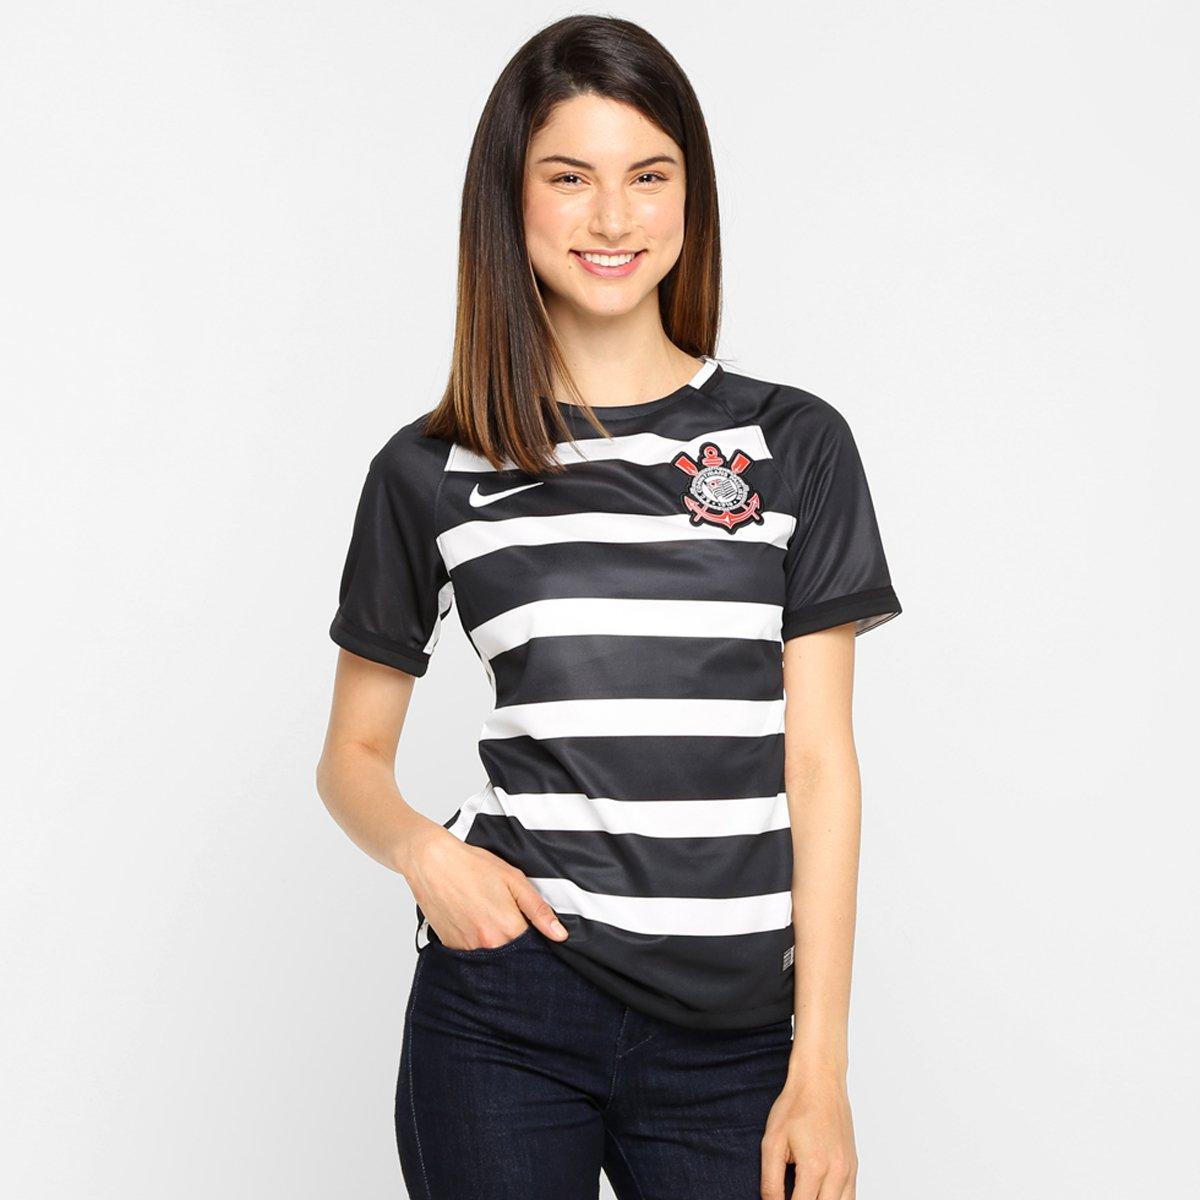 Camisa Feminina Nike Corinthians II 15 16 s nº - Compre Agora  e6fc9fe105fc8